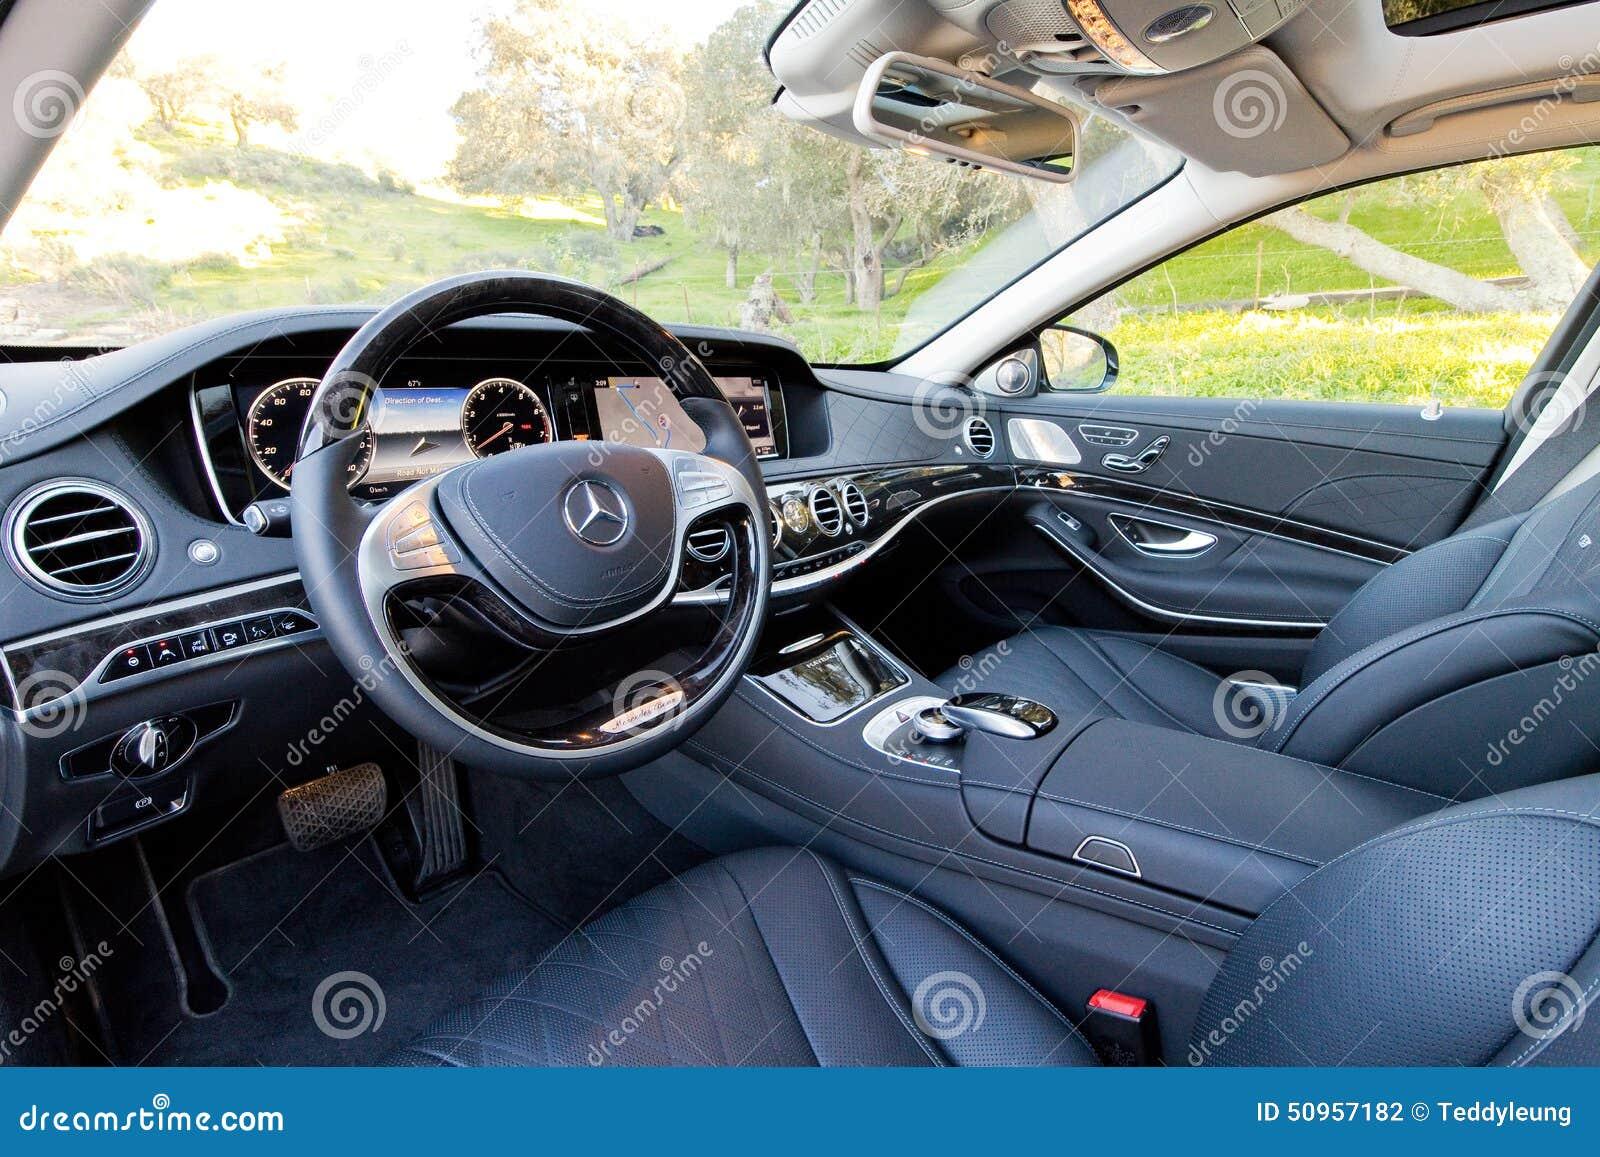 mercedes maybach s 600 2015 interior editorial photography - Mercedes Maybach Interior